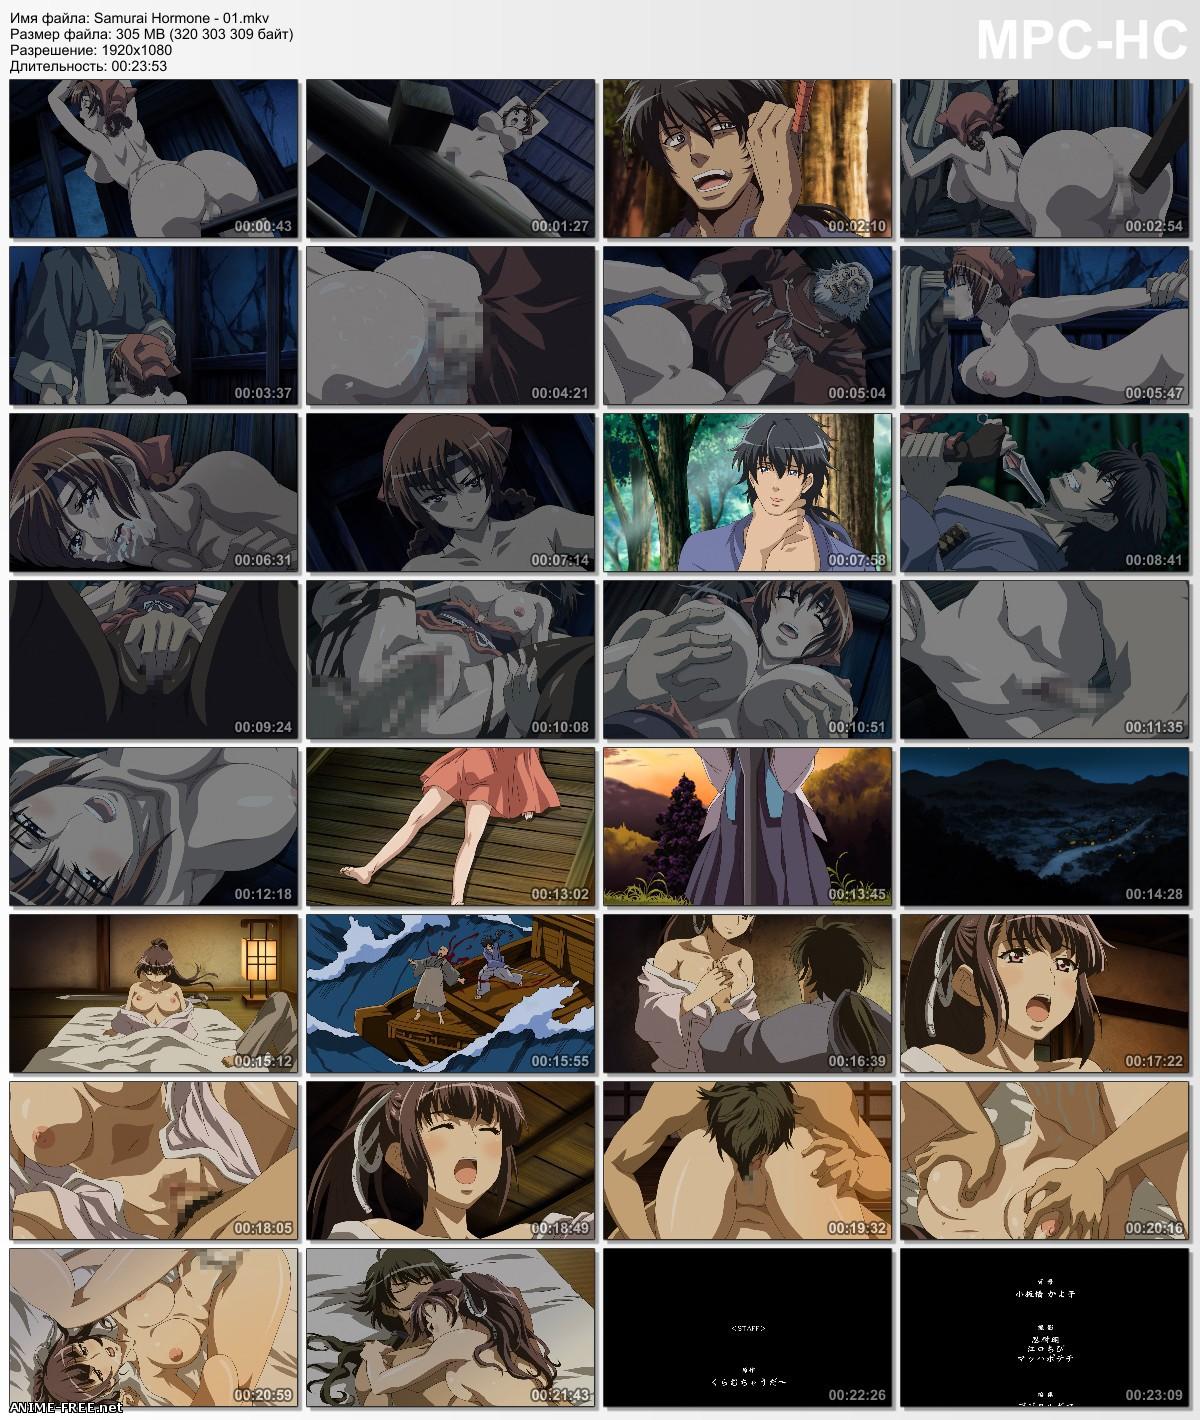 Samurai Hormone The Animation / Самурай Гормон [Ep.1] [1080p] [RUS,ENG,JAP] Anime Hentai